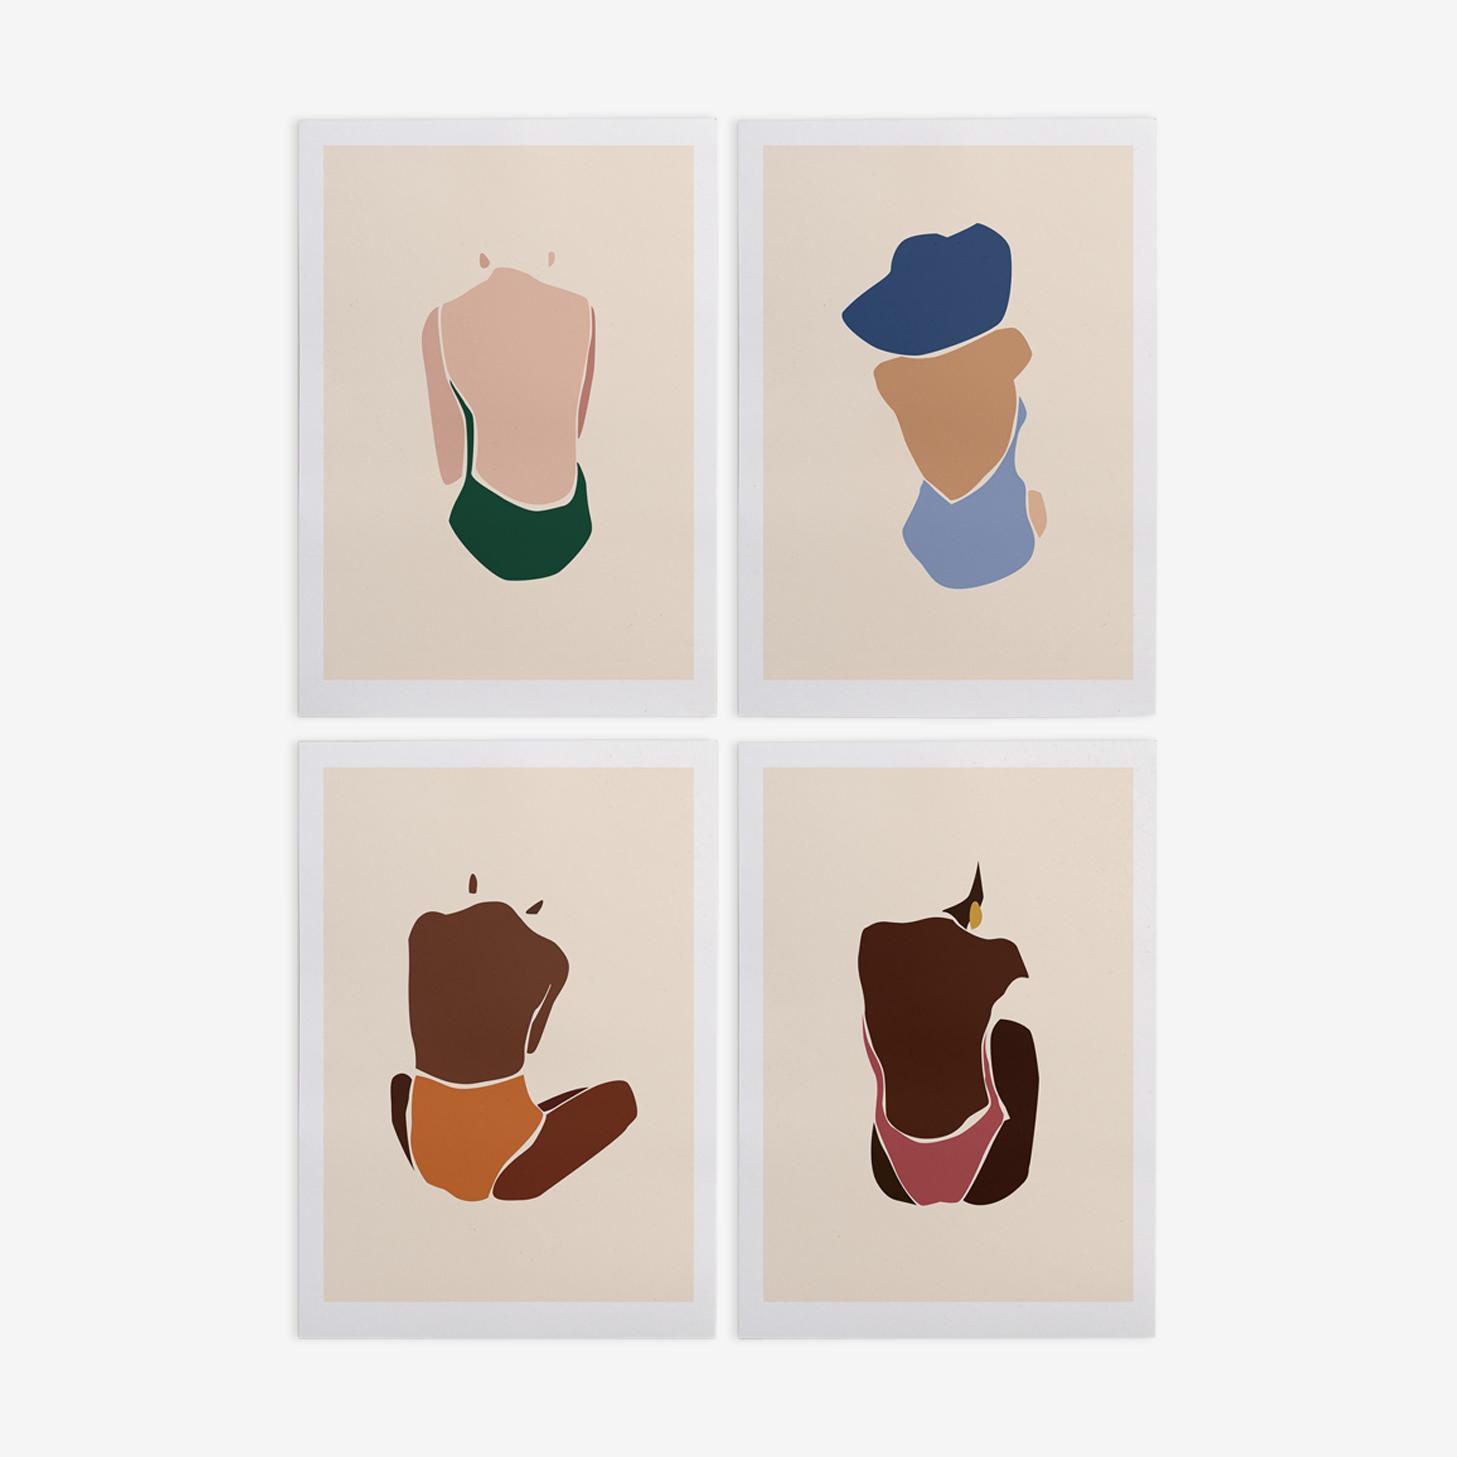 Les Baigneuses illustration, A4